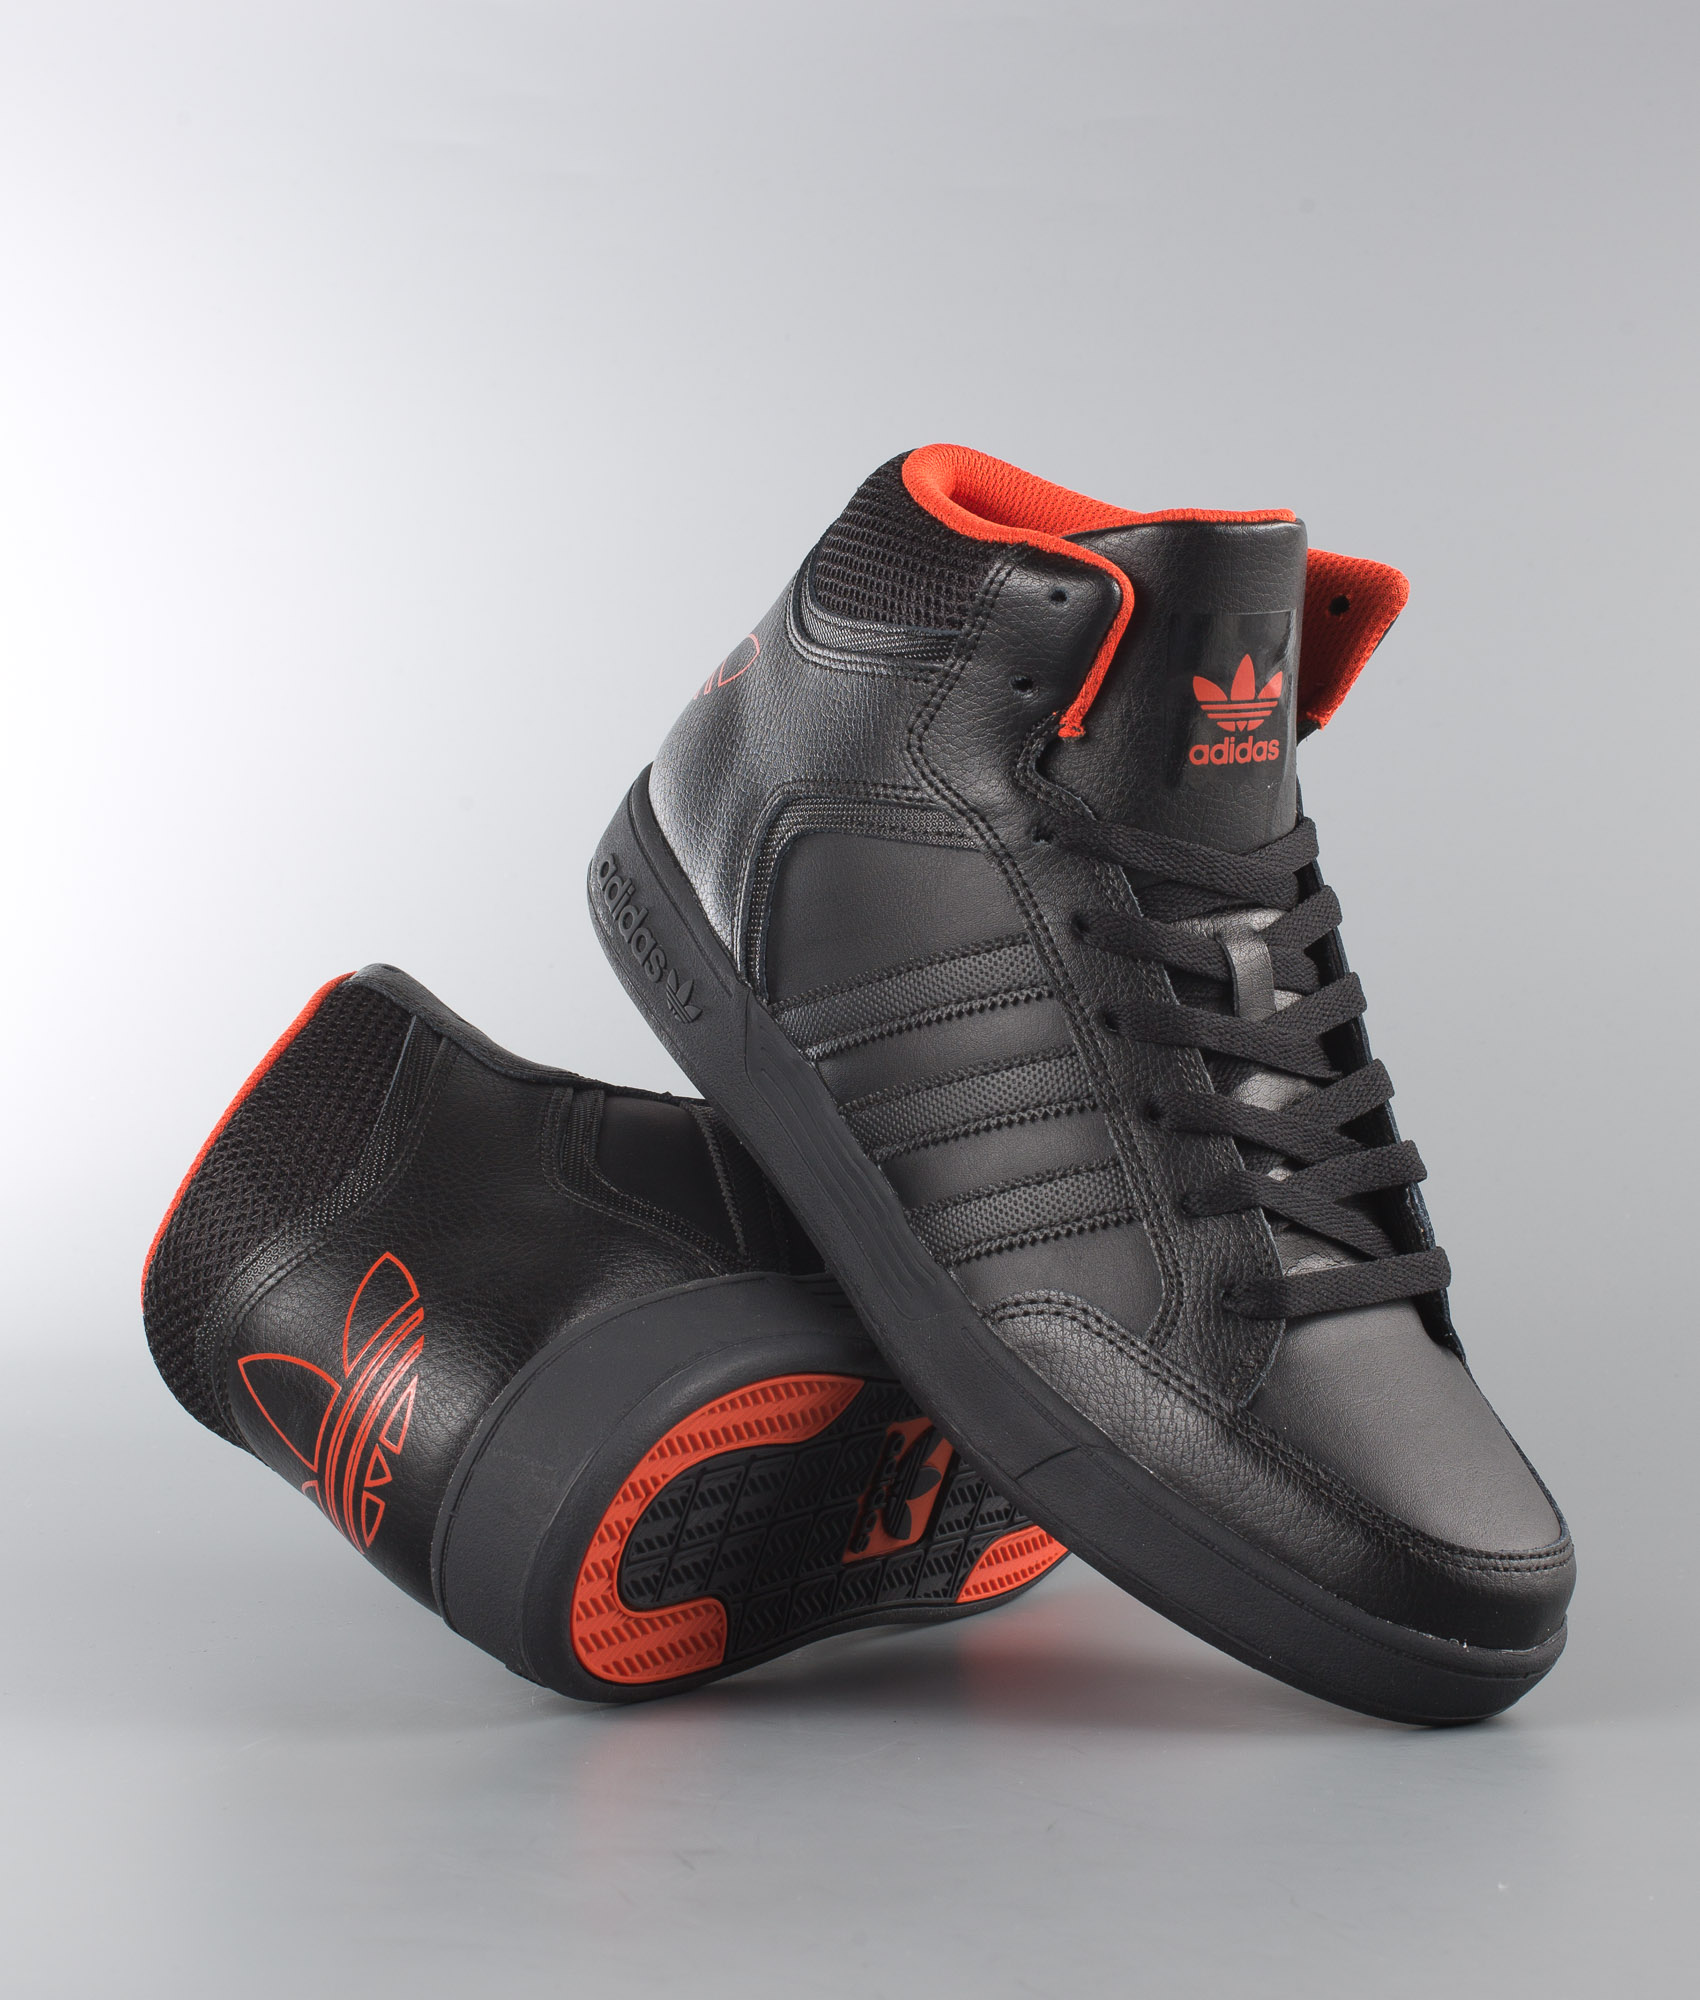 adidas Varial Mid shoes black neon orange